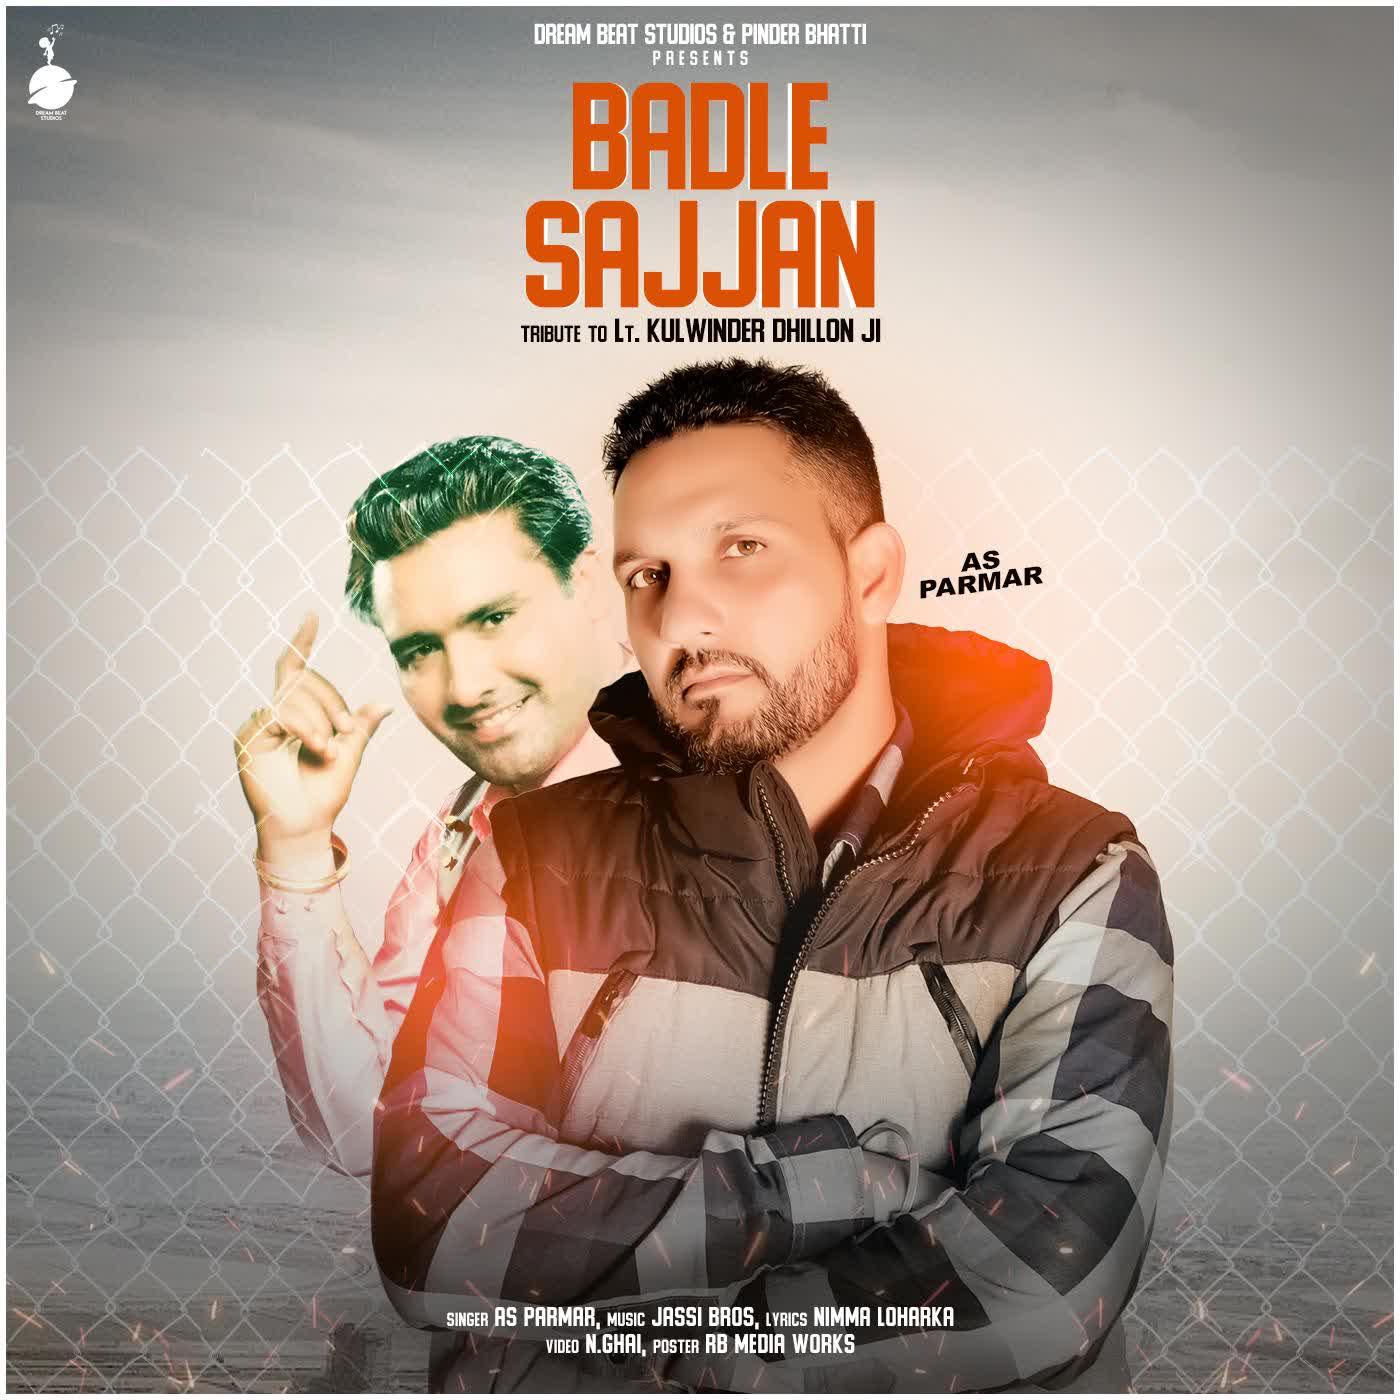 Badle Sajjan Cover As Parmar